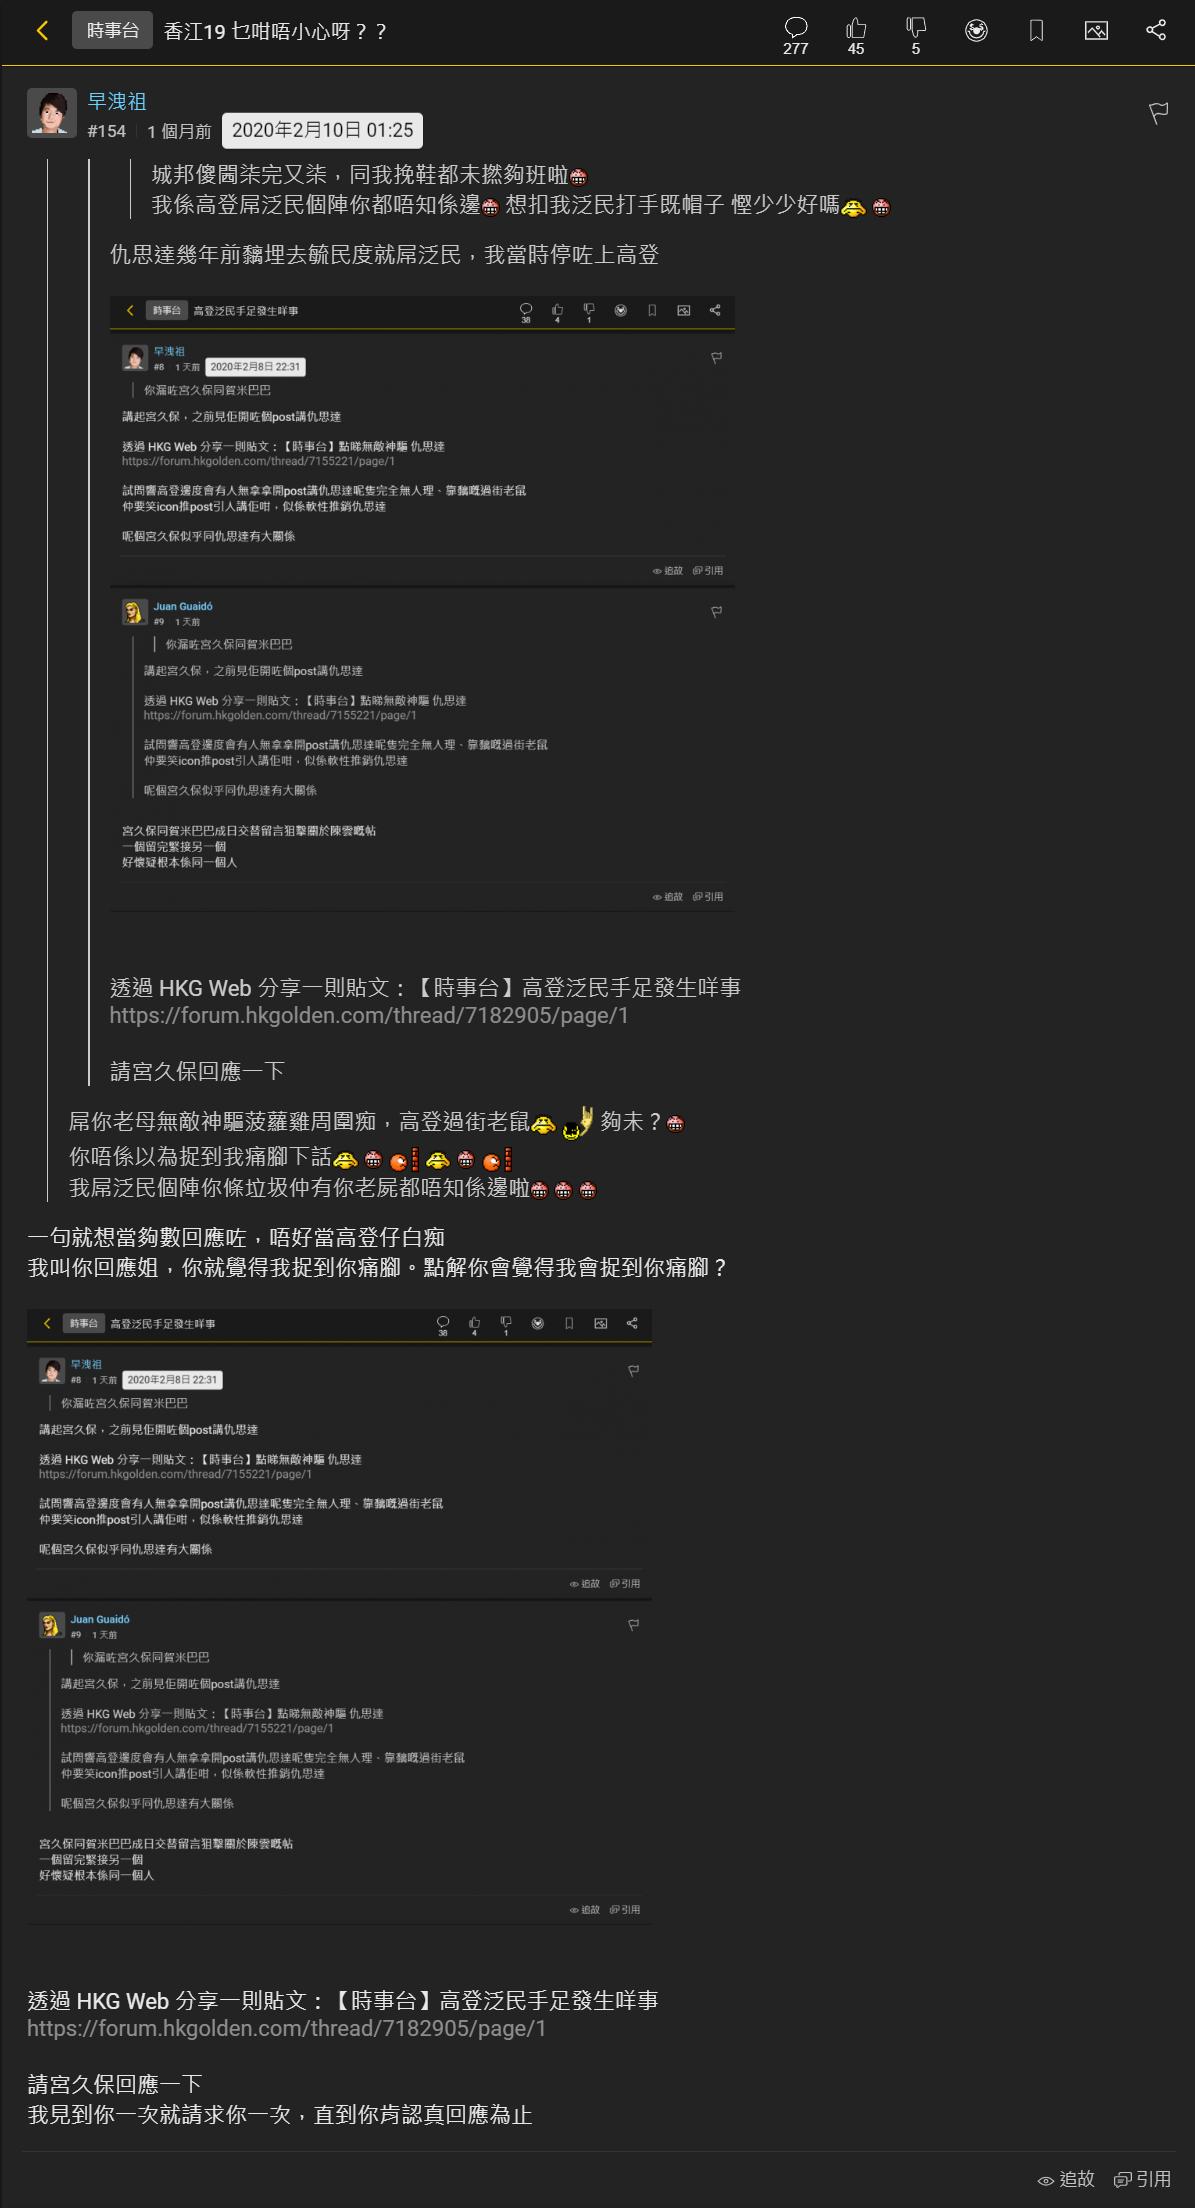 https://upload.cc/i1/2020/03/12/IQm1Rr.png